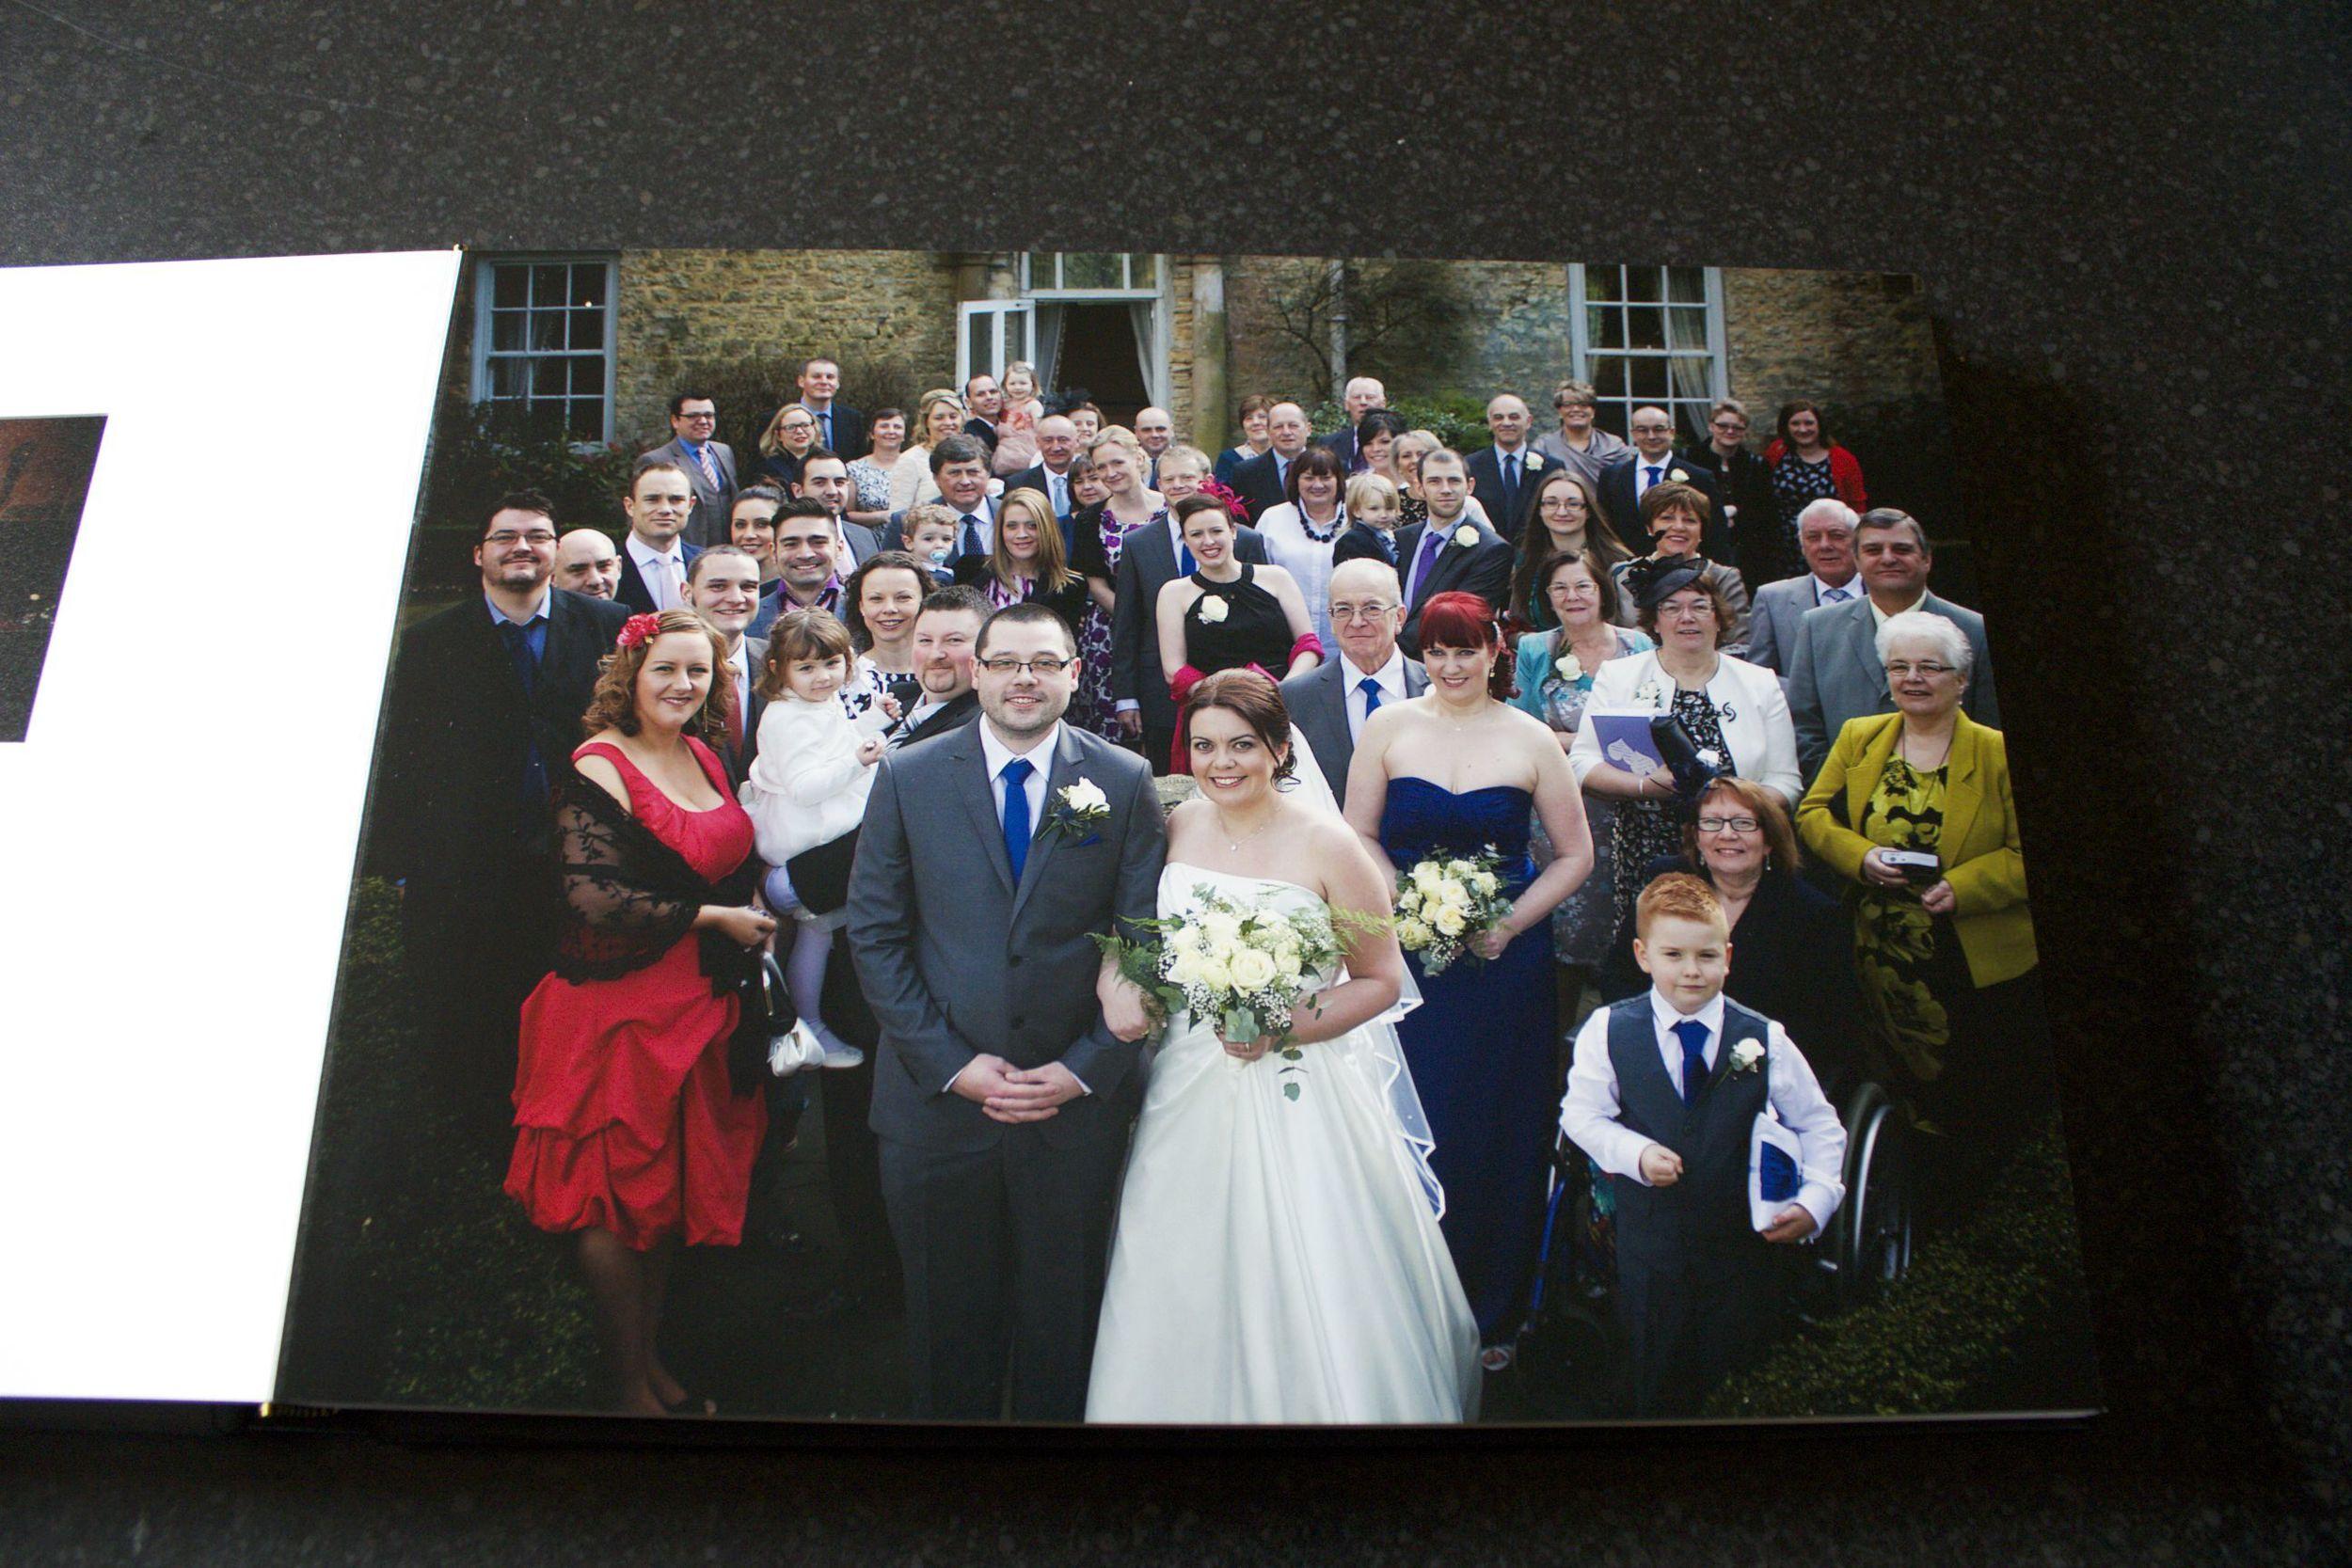 Tony Sarlo Wedding Album - Group Shot